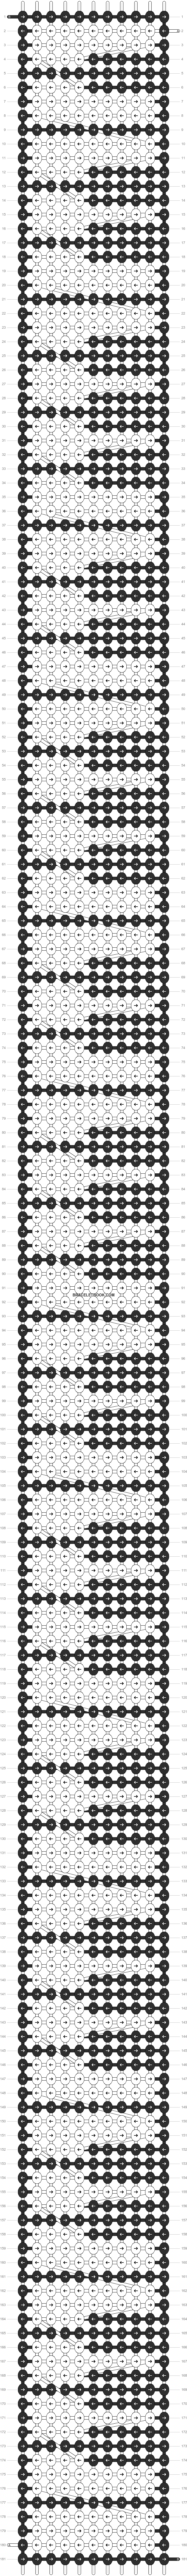 Alpha pattern #1780 pattern